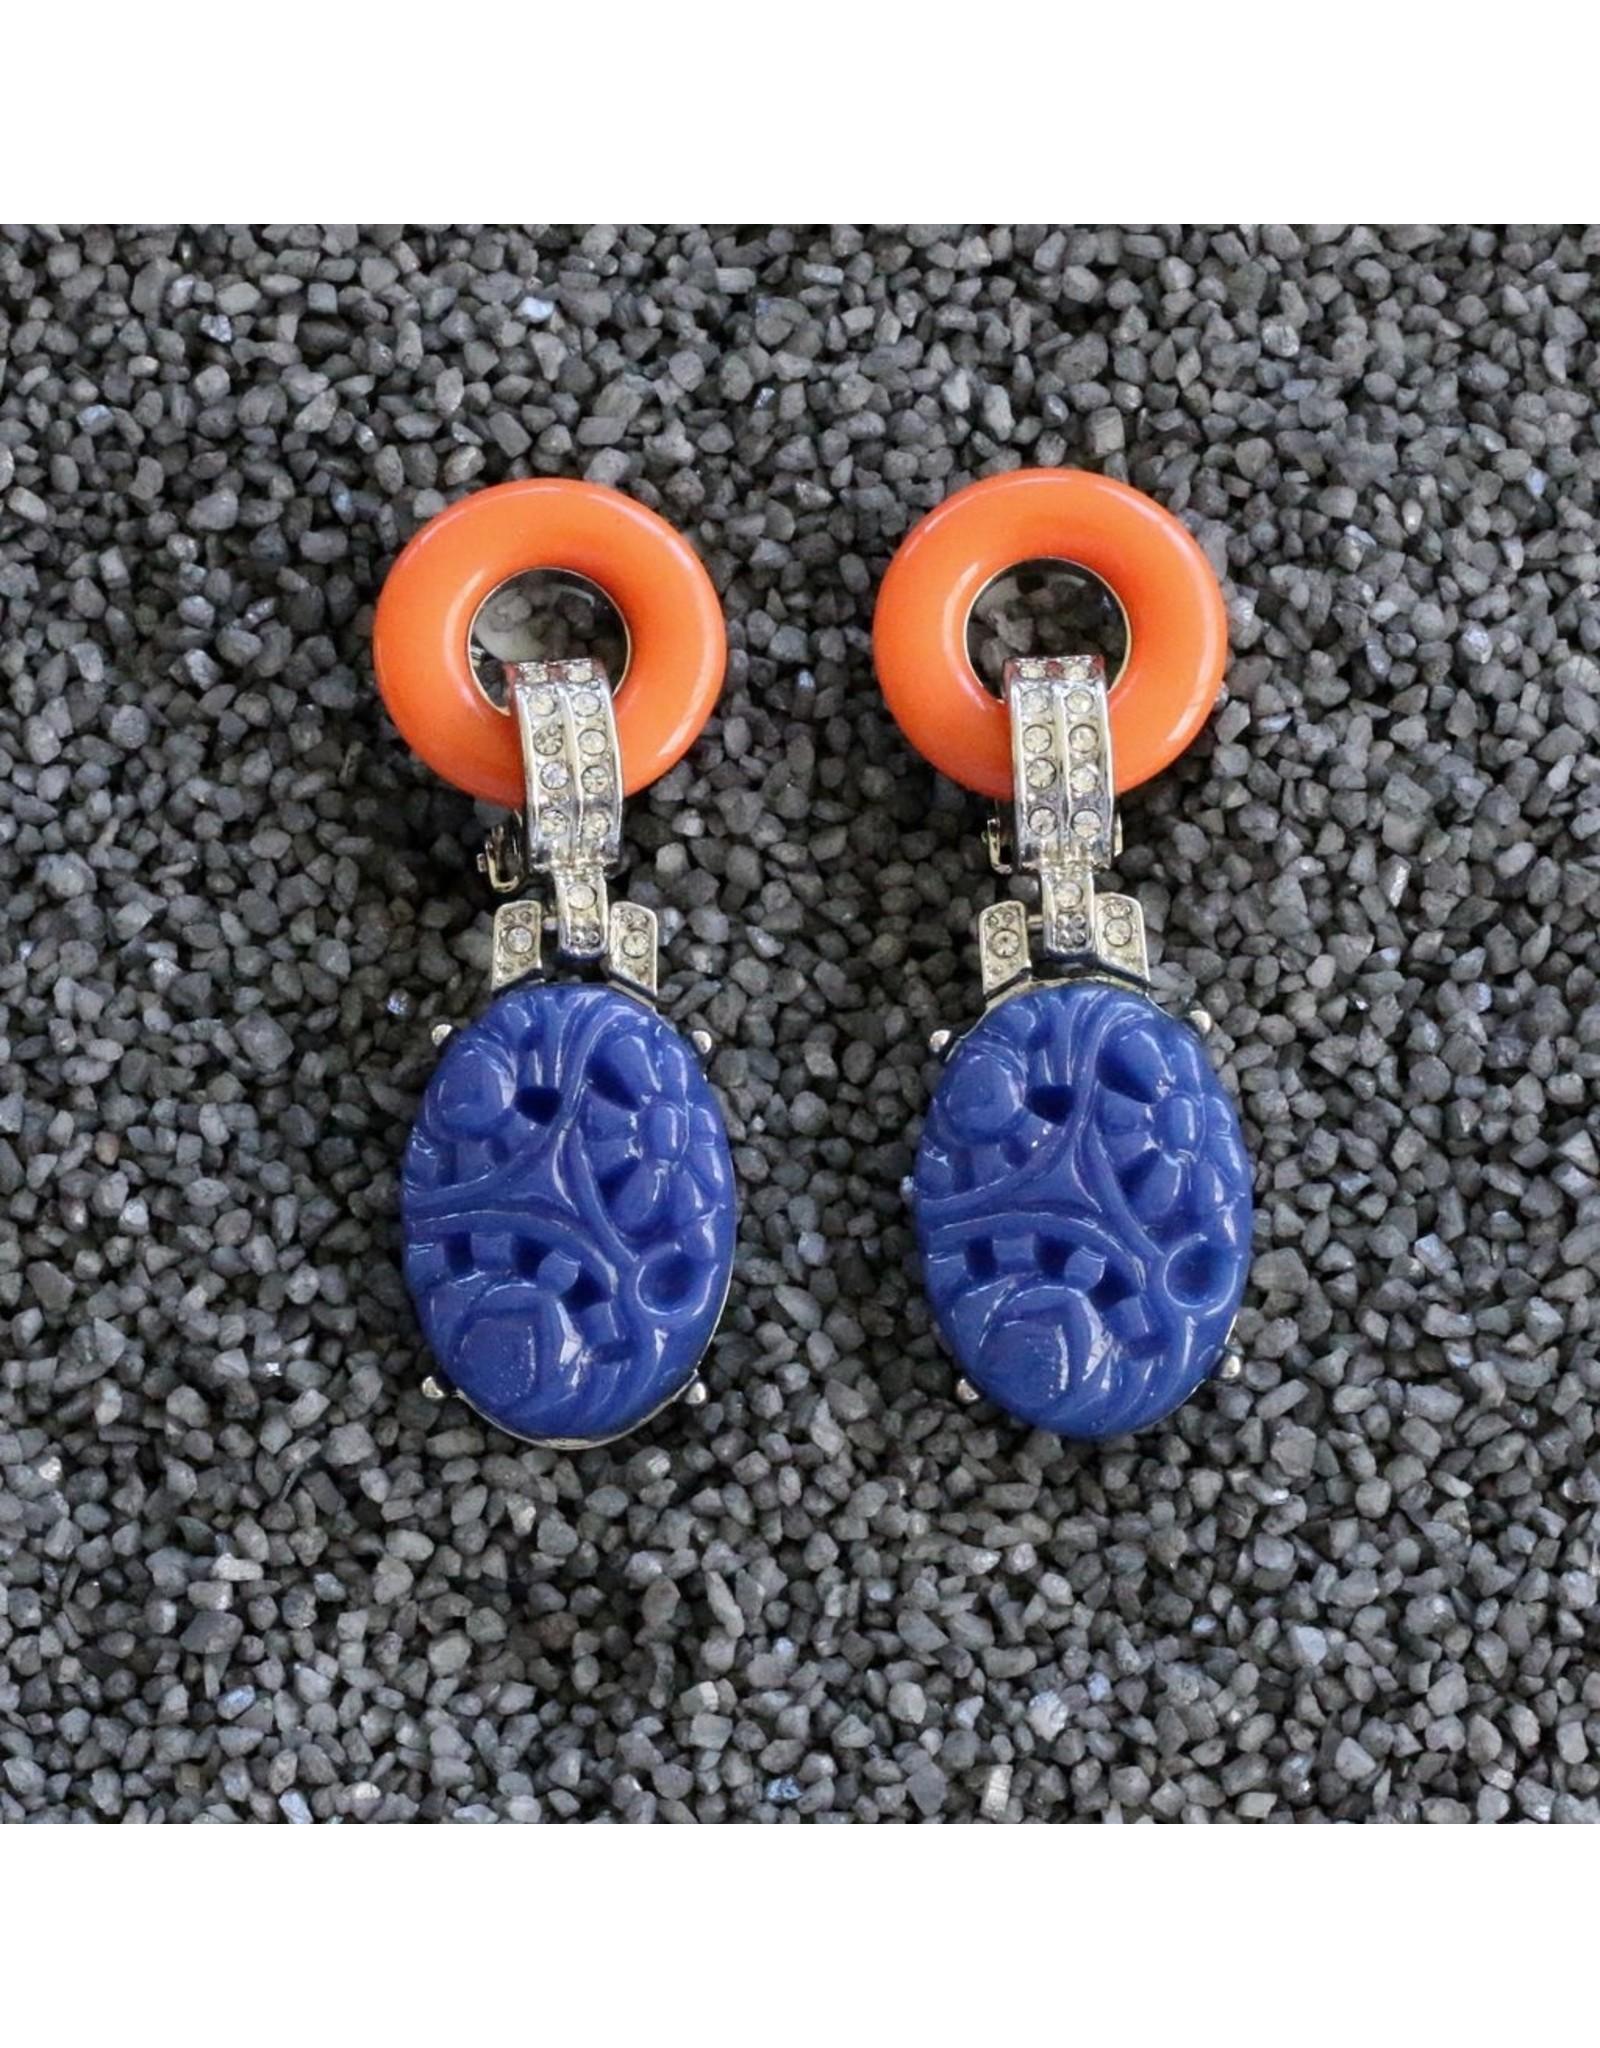 Kenneth Jay Lane KJLane: Carved Blue Jade Art Deco Clip On